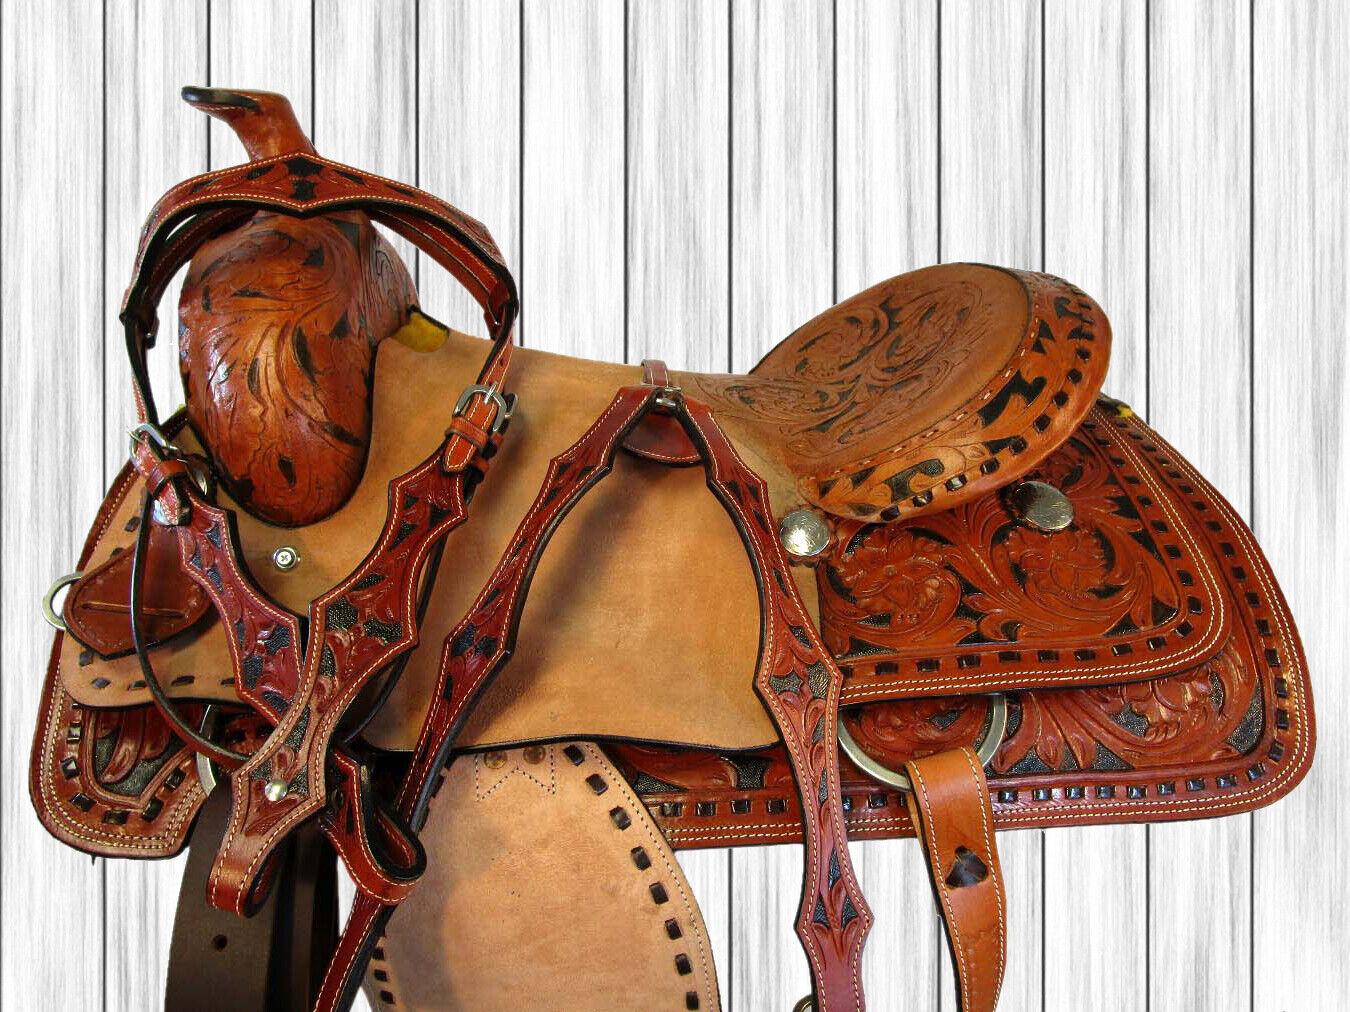 Usado 16 17 duro asiento Rodeo Rancho Trail Roper amarrar Cowboy Western Horse Saddle